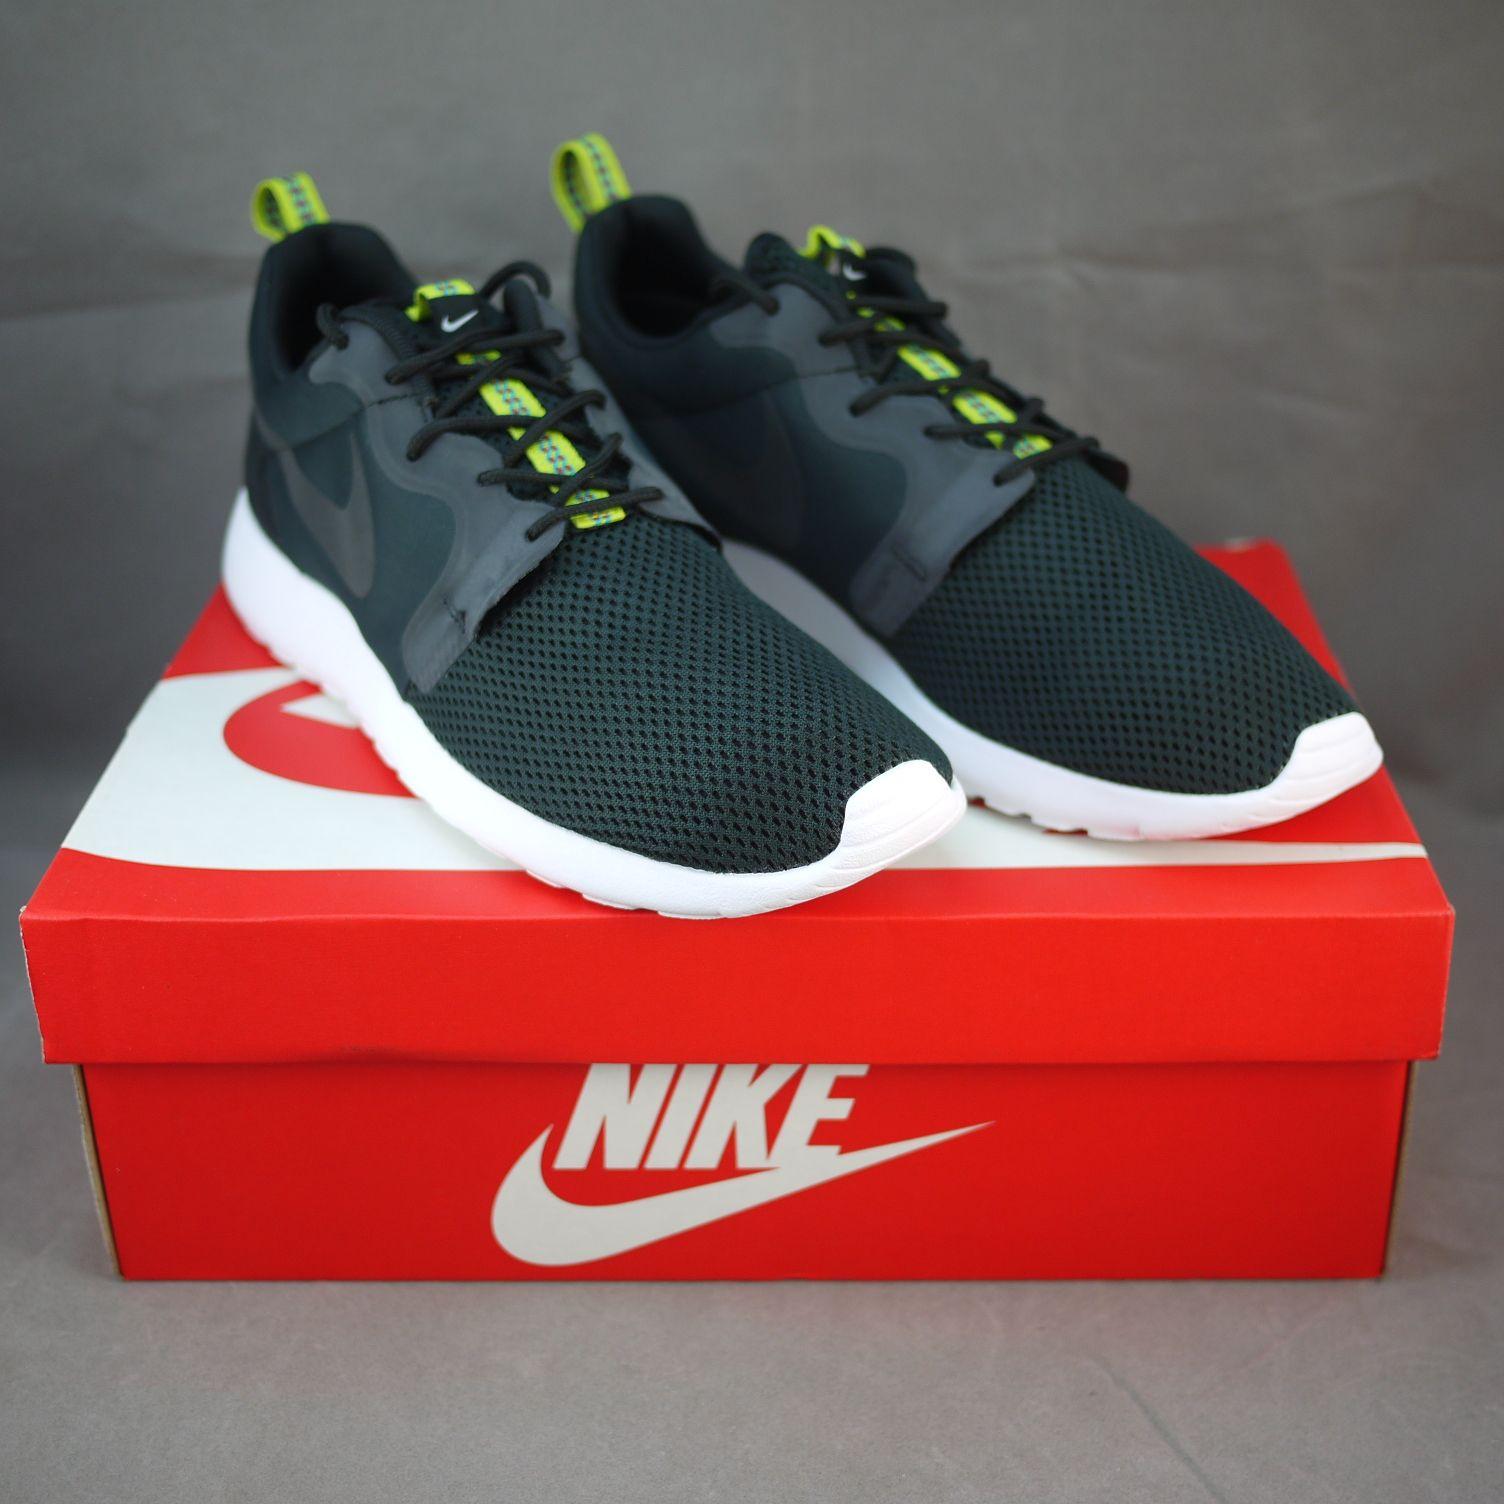 582febf37 Nike Roshe Run Hyperfuse Men 636220-003 Black   Black-Anthracite-Venom  Green 3M